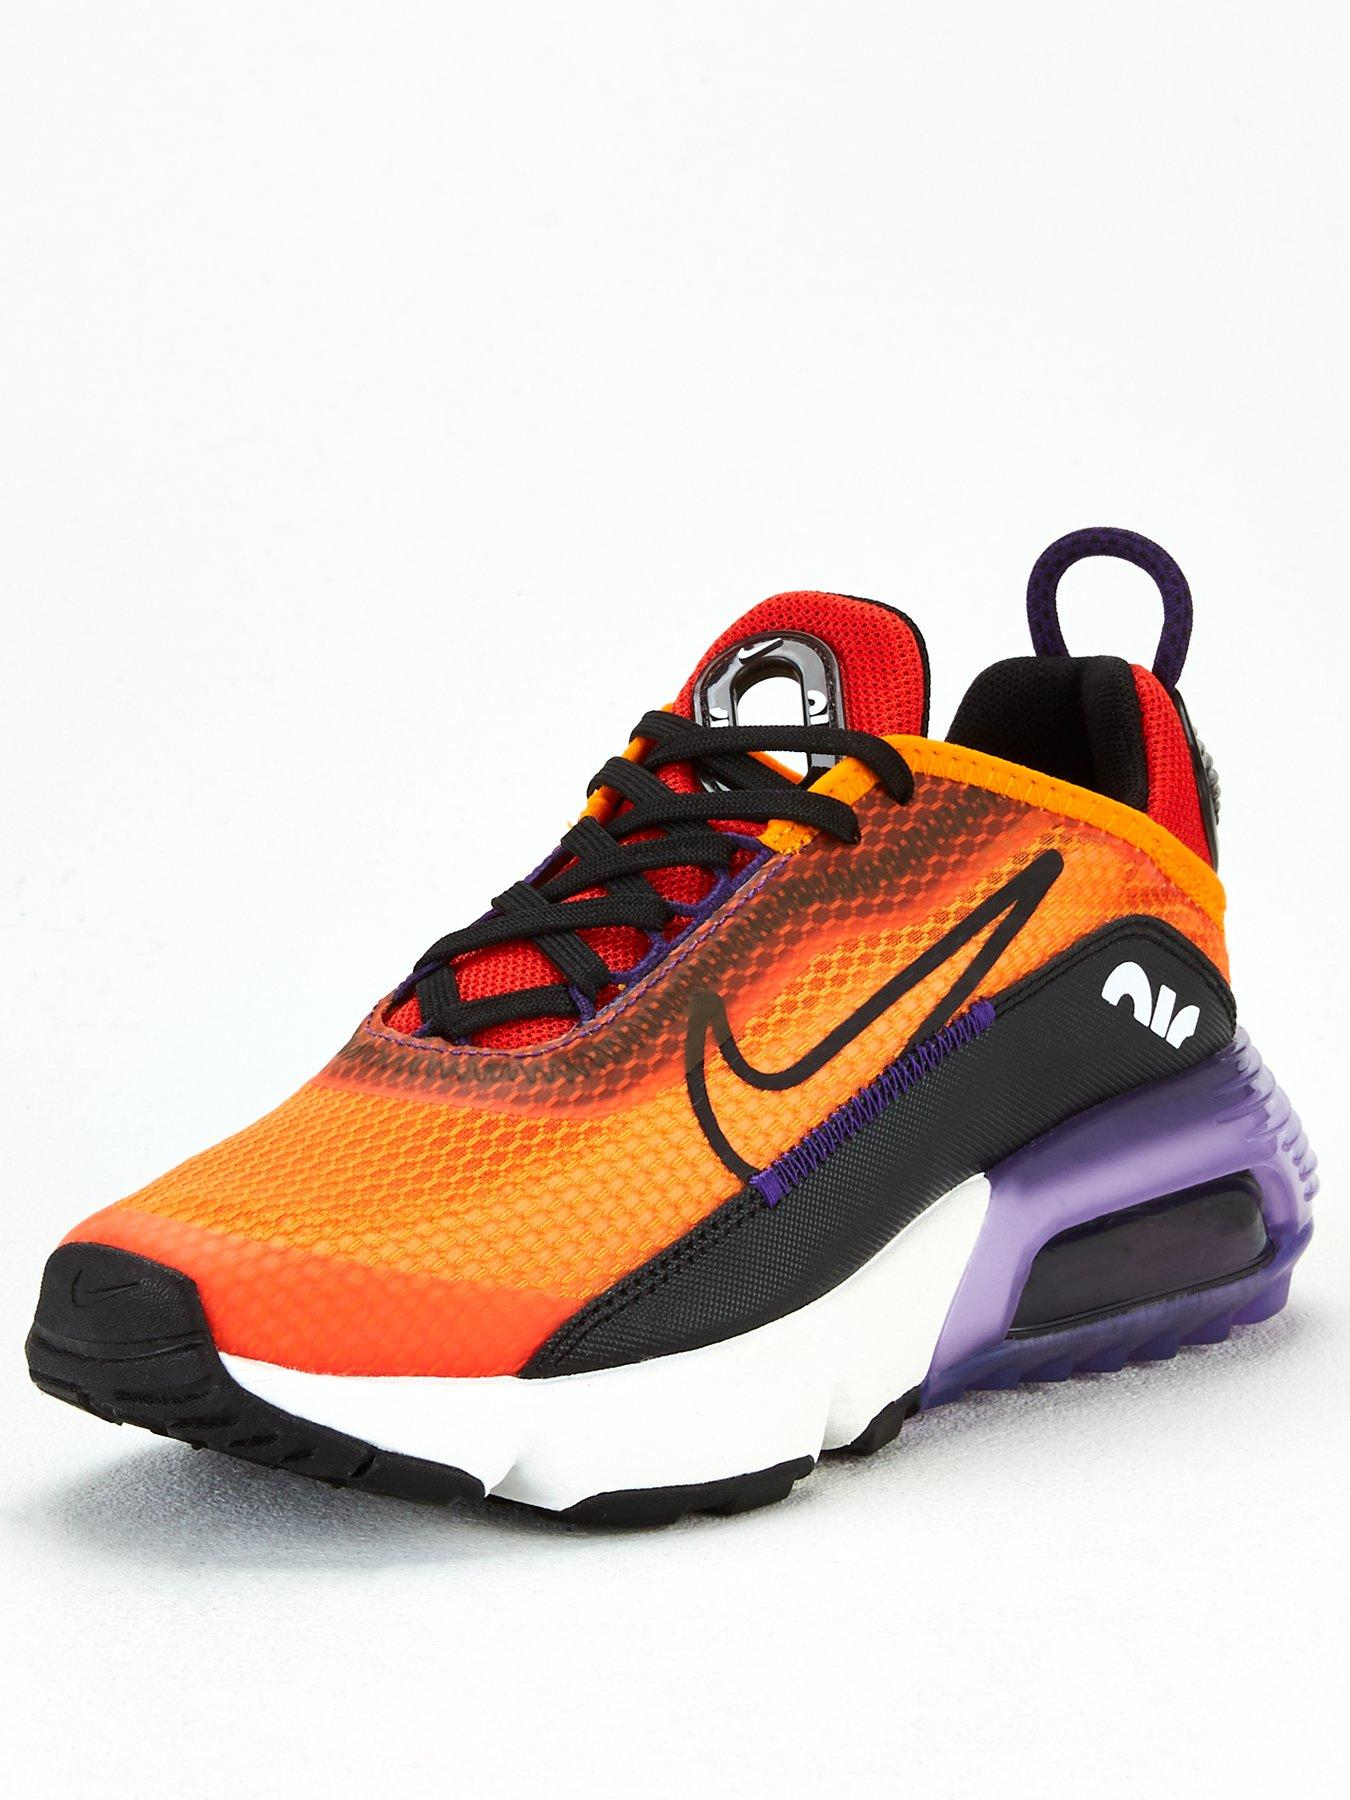 3.5 | Junior footwear (sizes 3-6